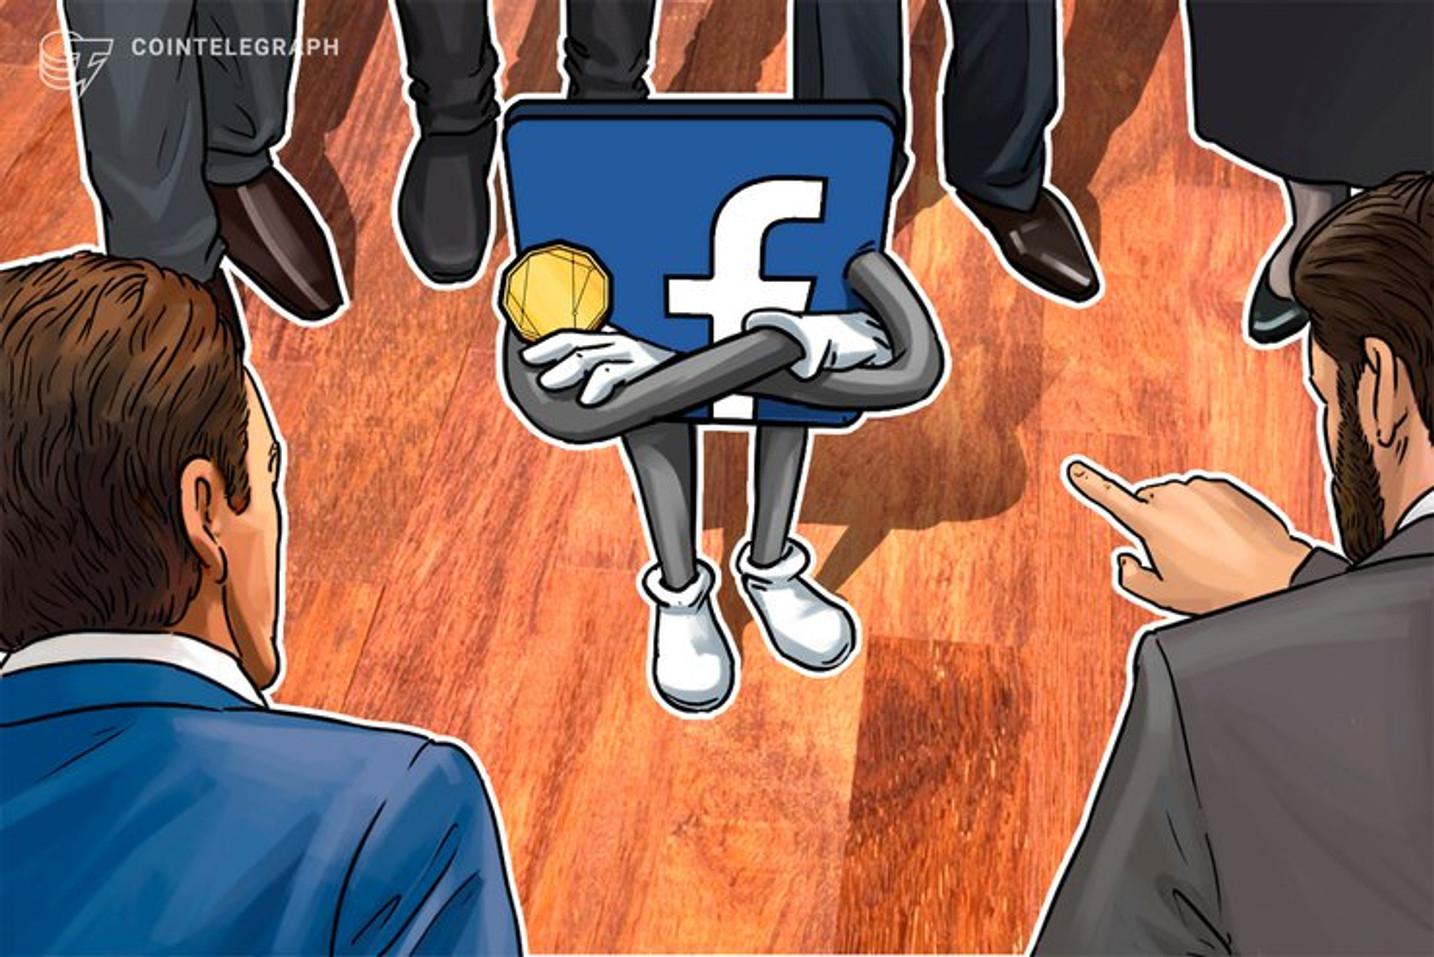 BaFin-Chef Hufeld drängt wegen Facebook-Kryptowährung auf globale Regulierung